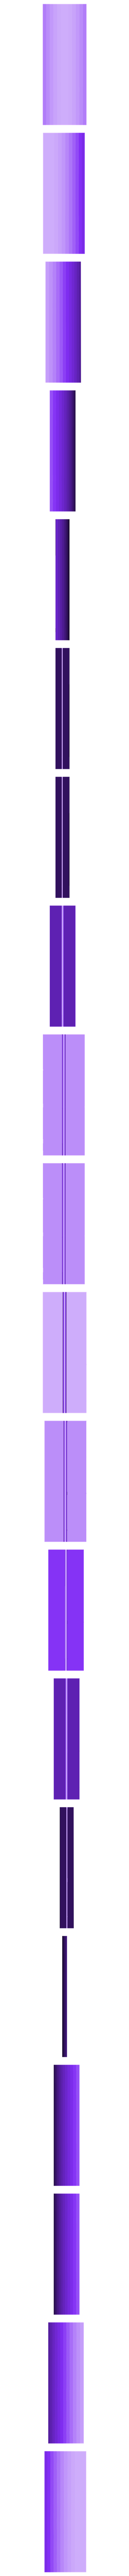 blade_piece_100mm_split_flat.stl Download free STL file Life-Sized Sword of Omens • 3D print template, Revalia6D